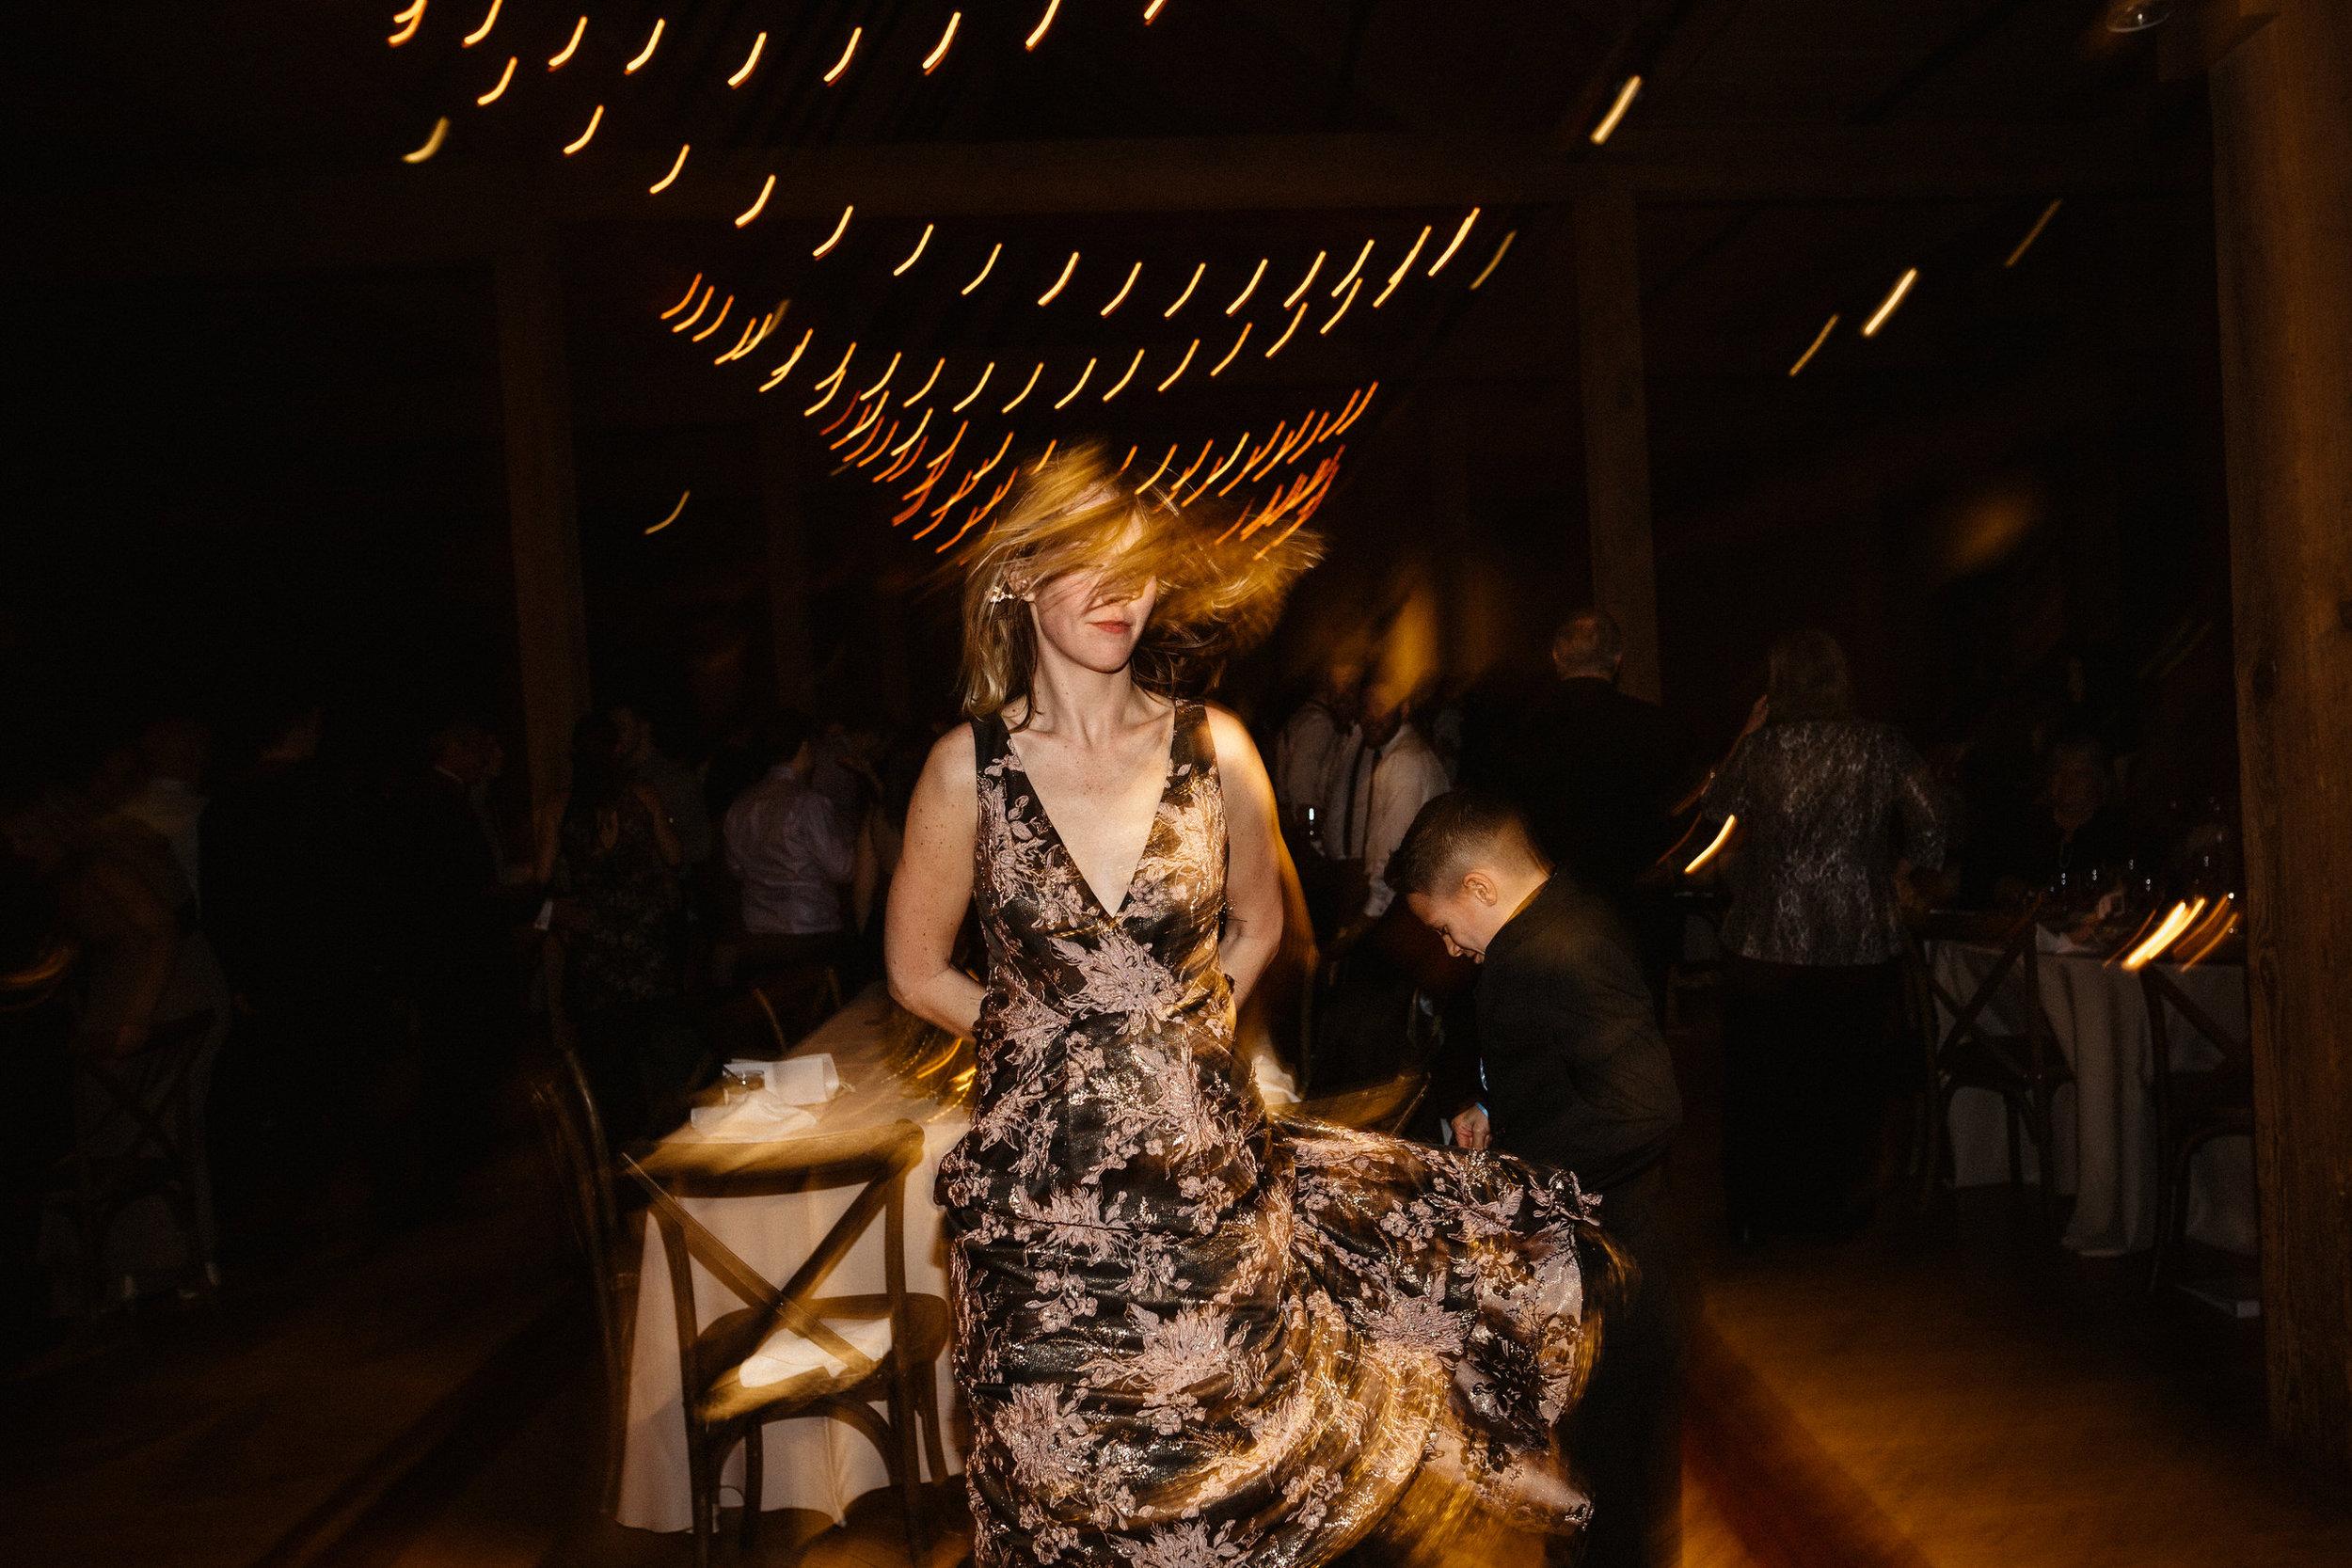 Chicago destination wedding photographer bridgeport art center118.JPG